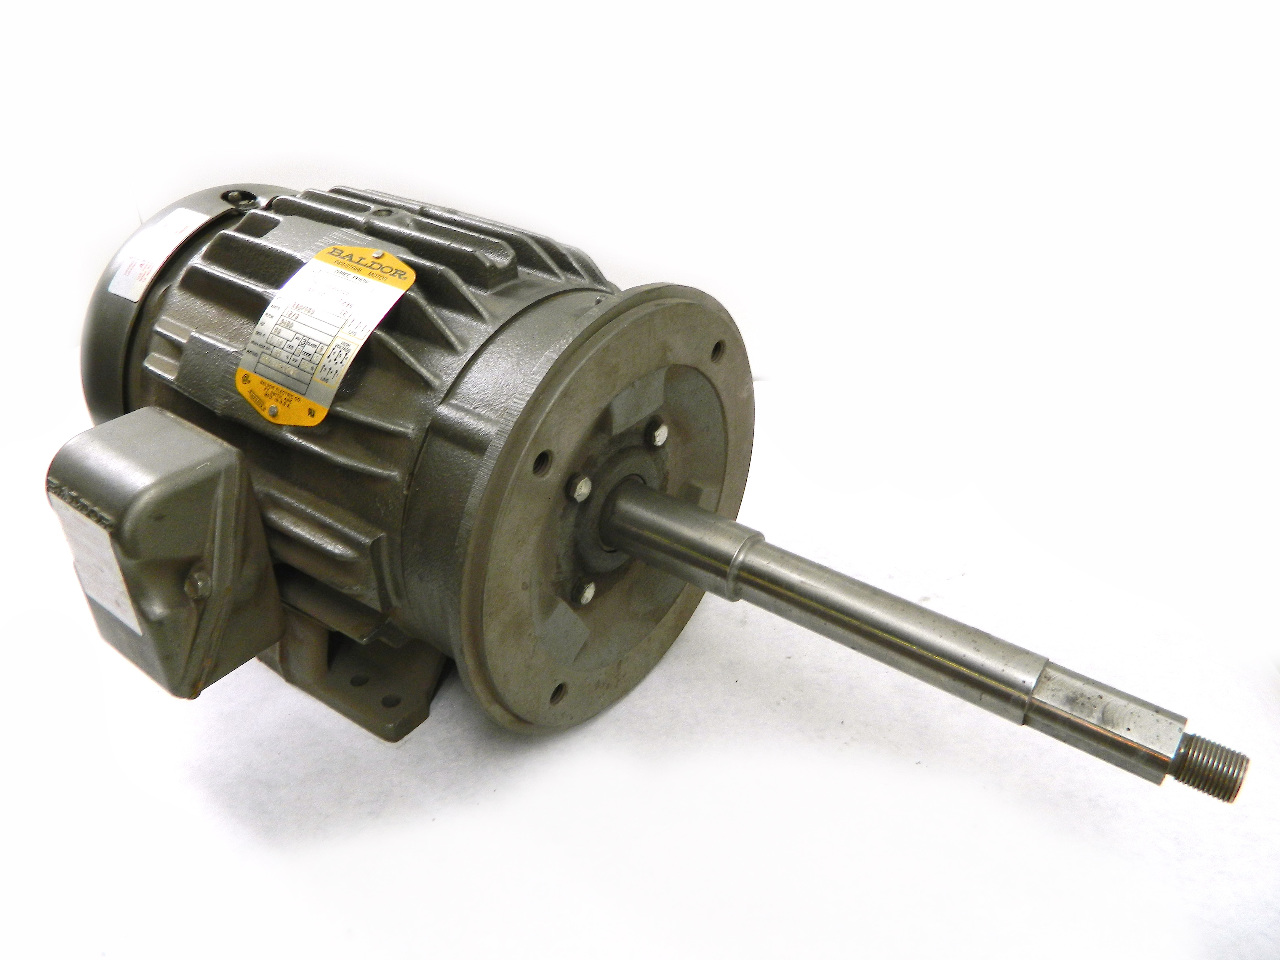 Baldor 5hp Electric Motor 3450 Rpm 184tcz Frame Te 208 460vac 3 Phase Ebay